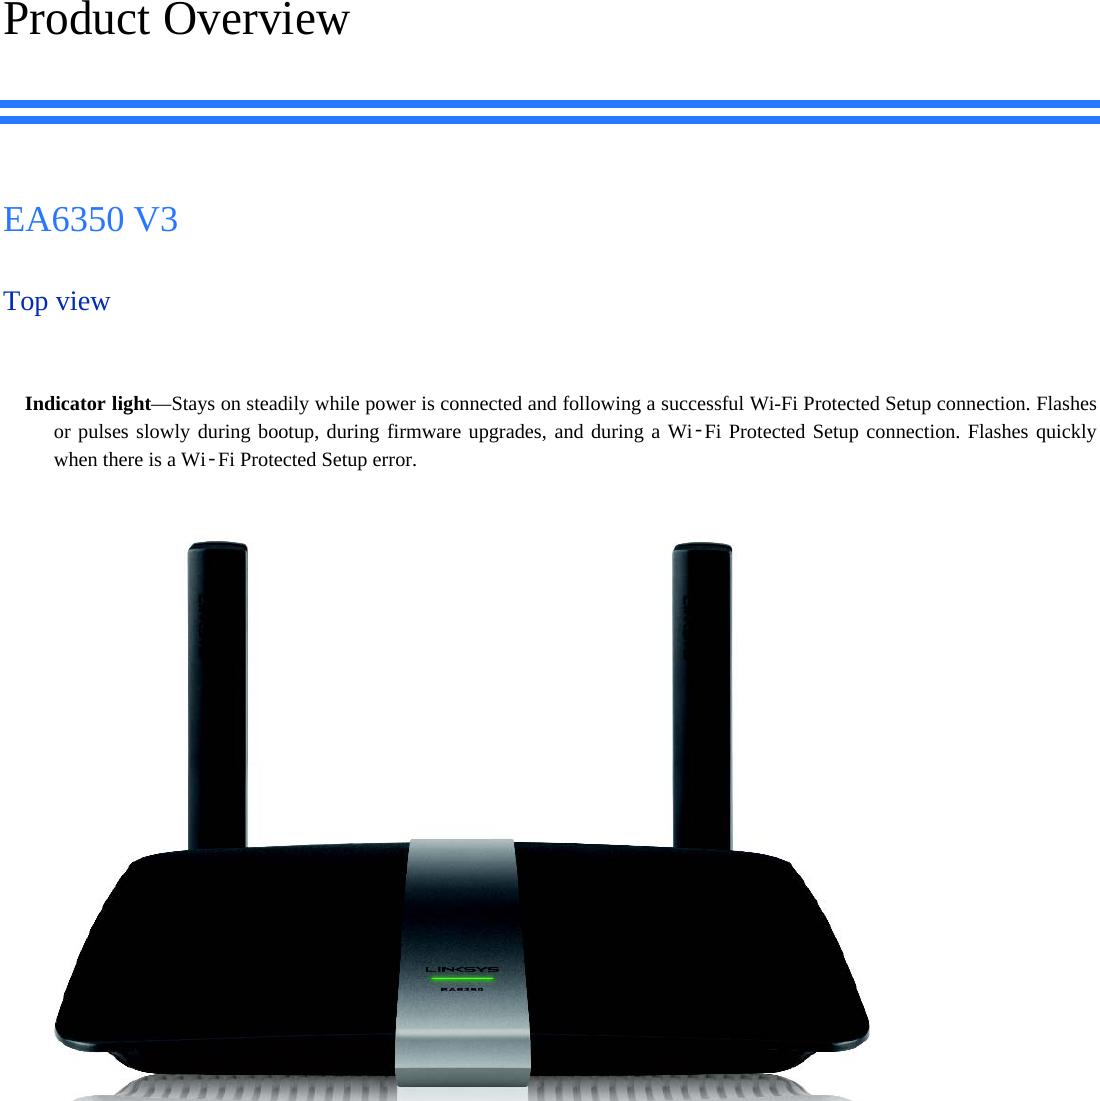 LINKSYS EA6350V3 Linksys Smart Wi-Fi Router AC1200 User Manual